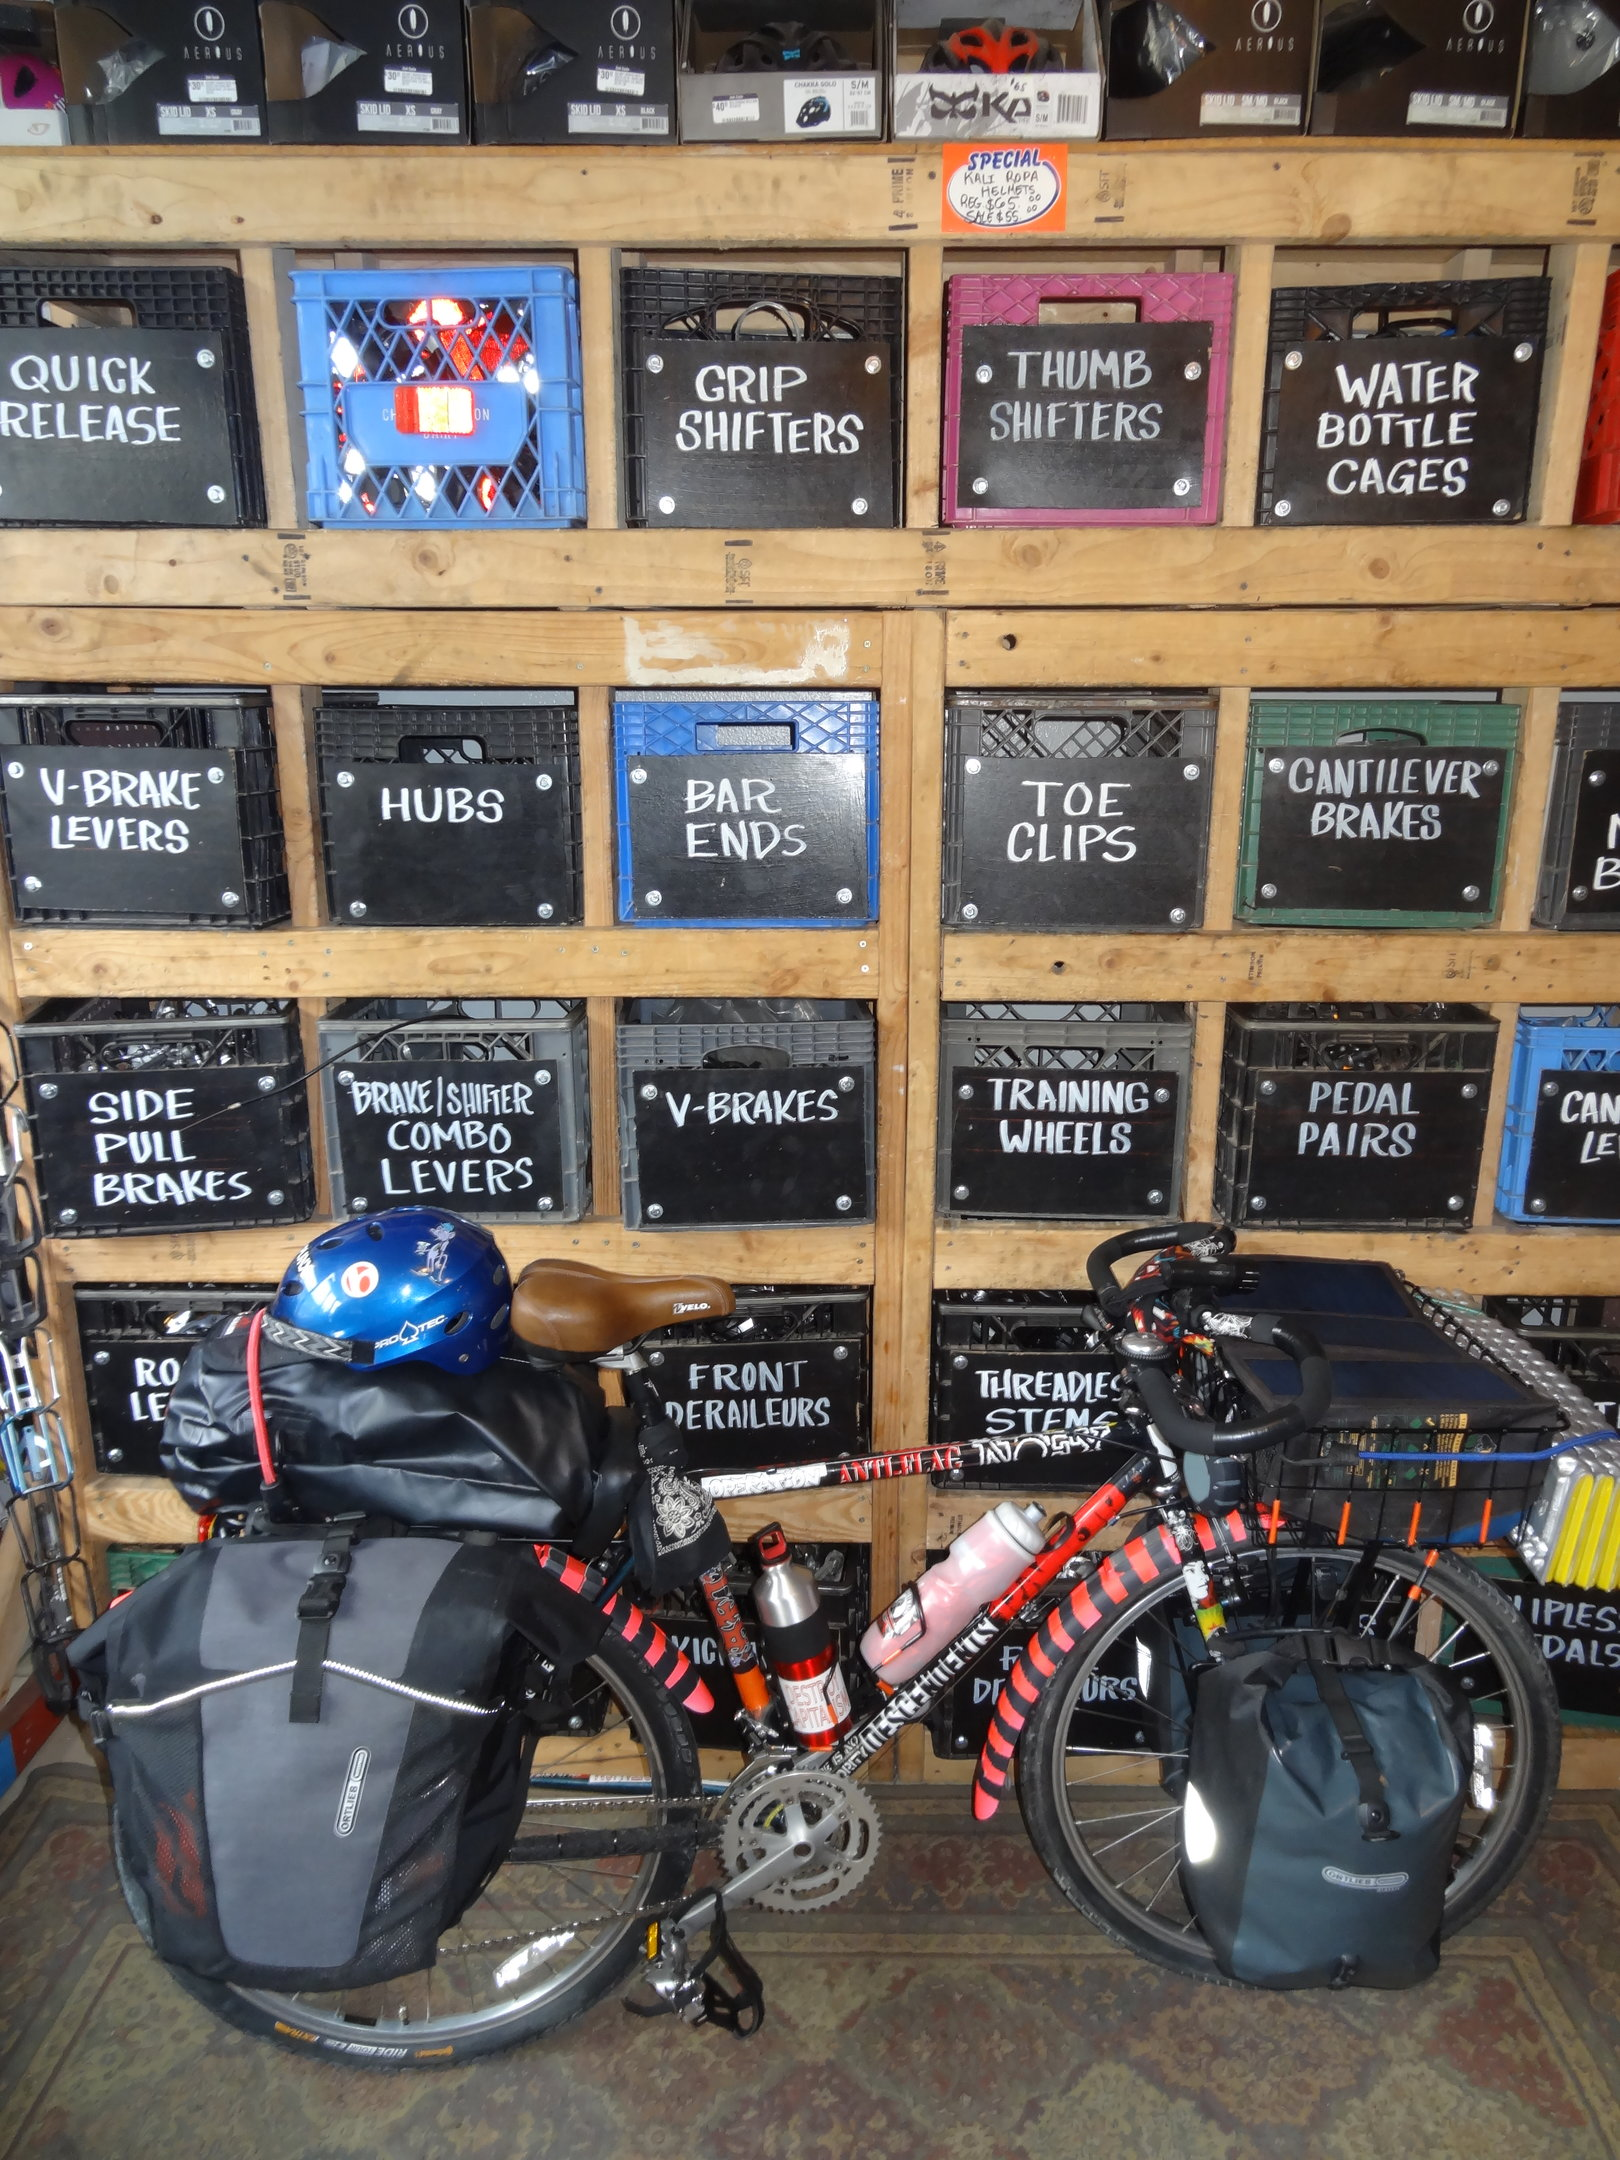 dsc00138-jpg.48429_FIRST EVER BIKE TOUR (PICS)_Bike Touring_Squat the Planet_2:26 PM